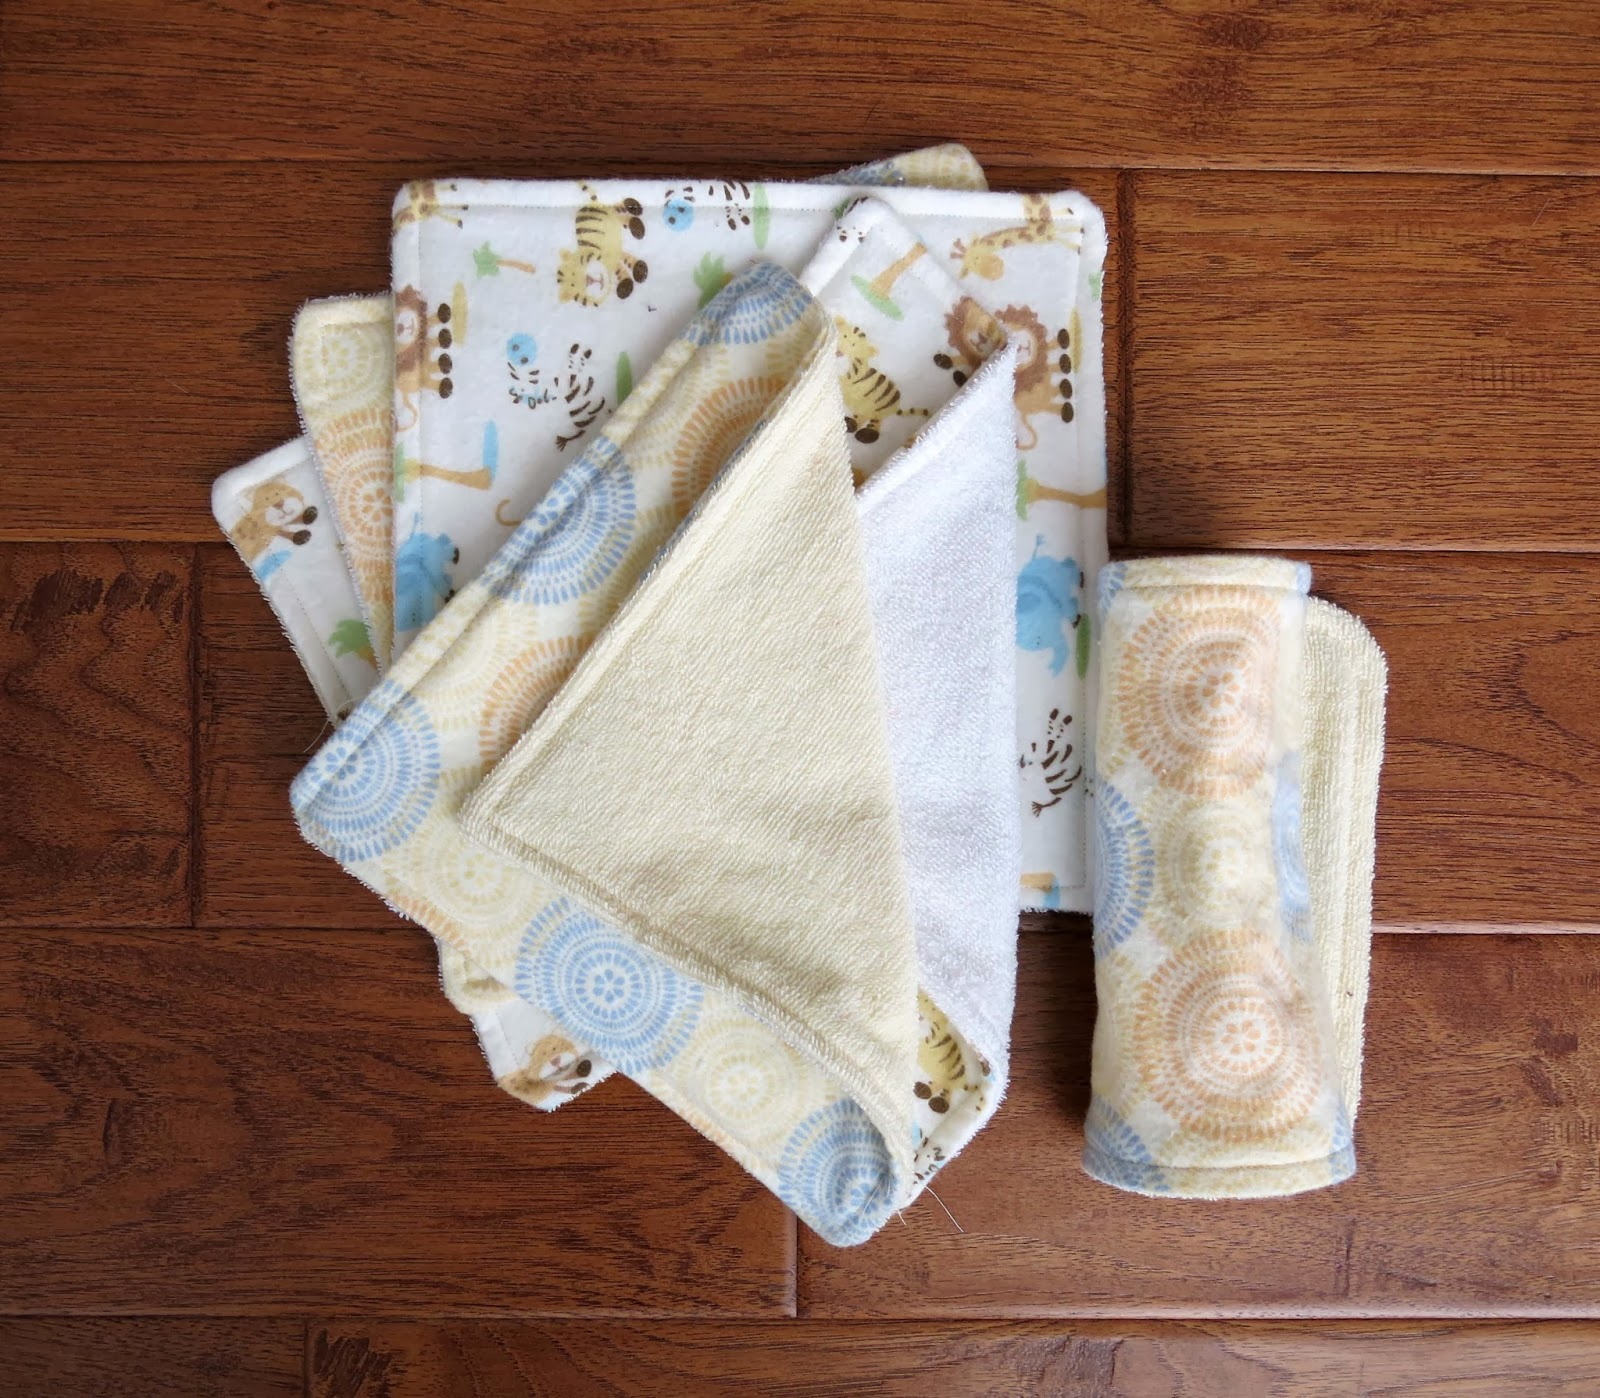 Wash Cloths As Burp Cloths: A Mighty Good Yarn: DIY Tutorial: Baby Washcloths And Burp